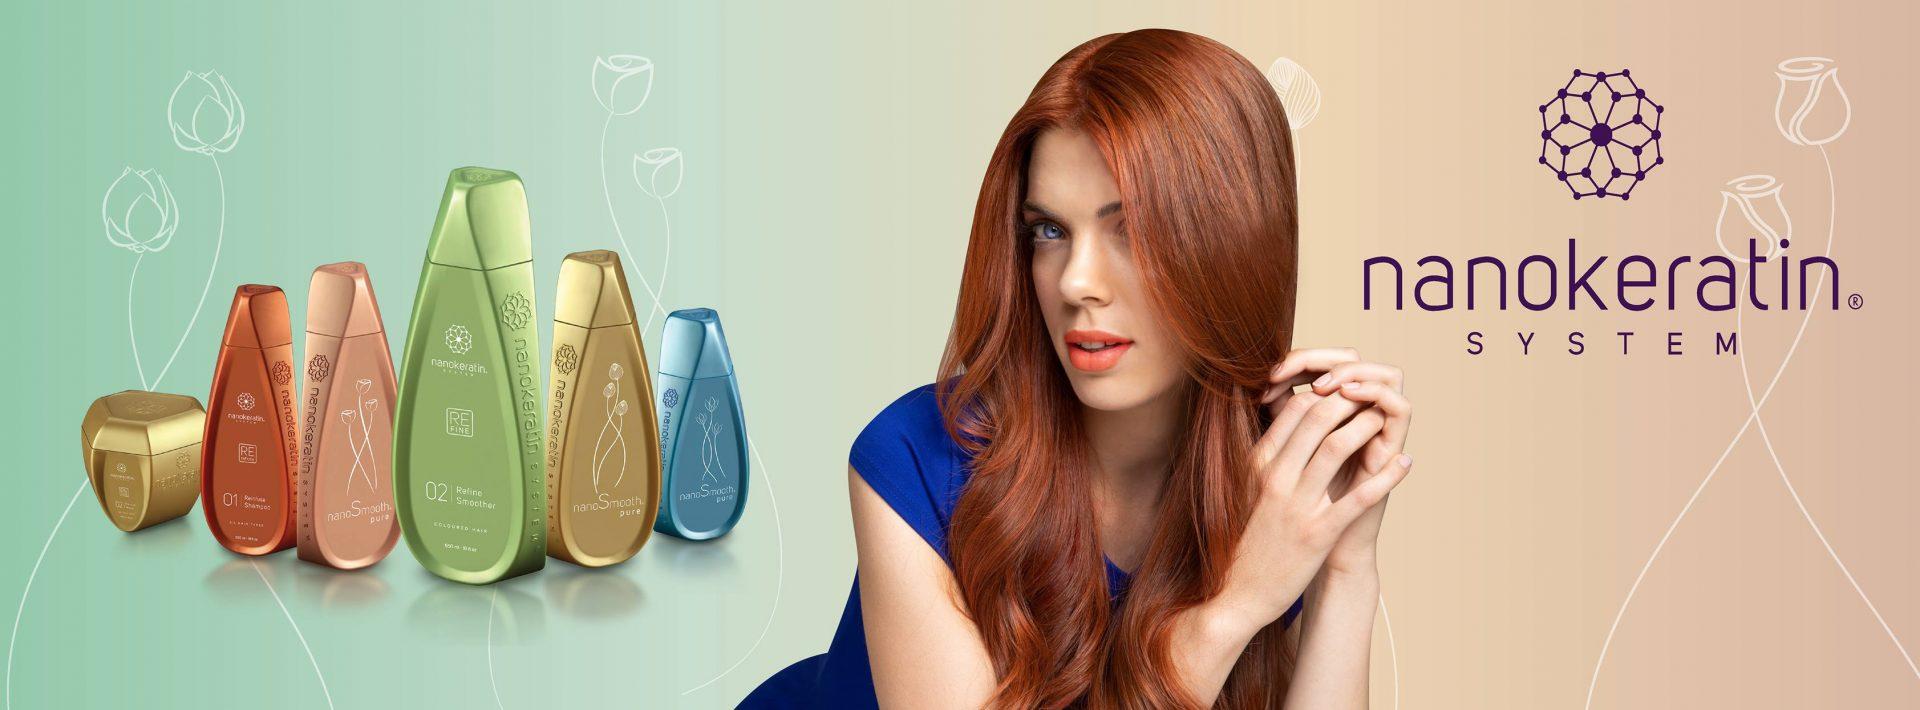 nanokeratin system brazillian blowdry  at East Putney Hair Salon